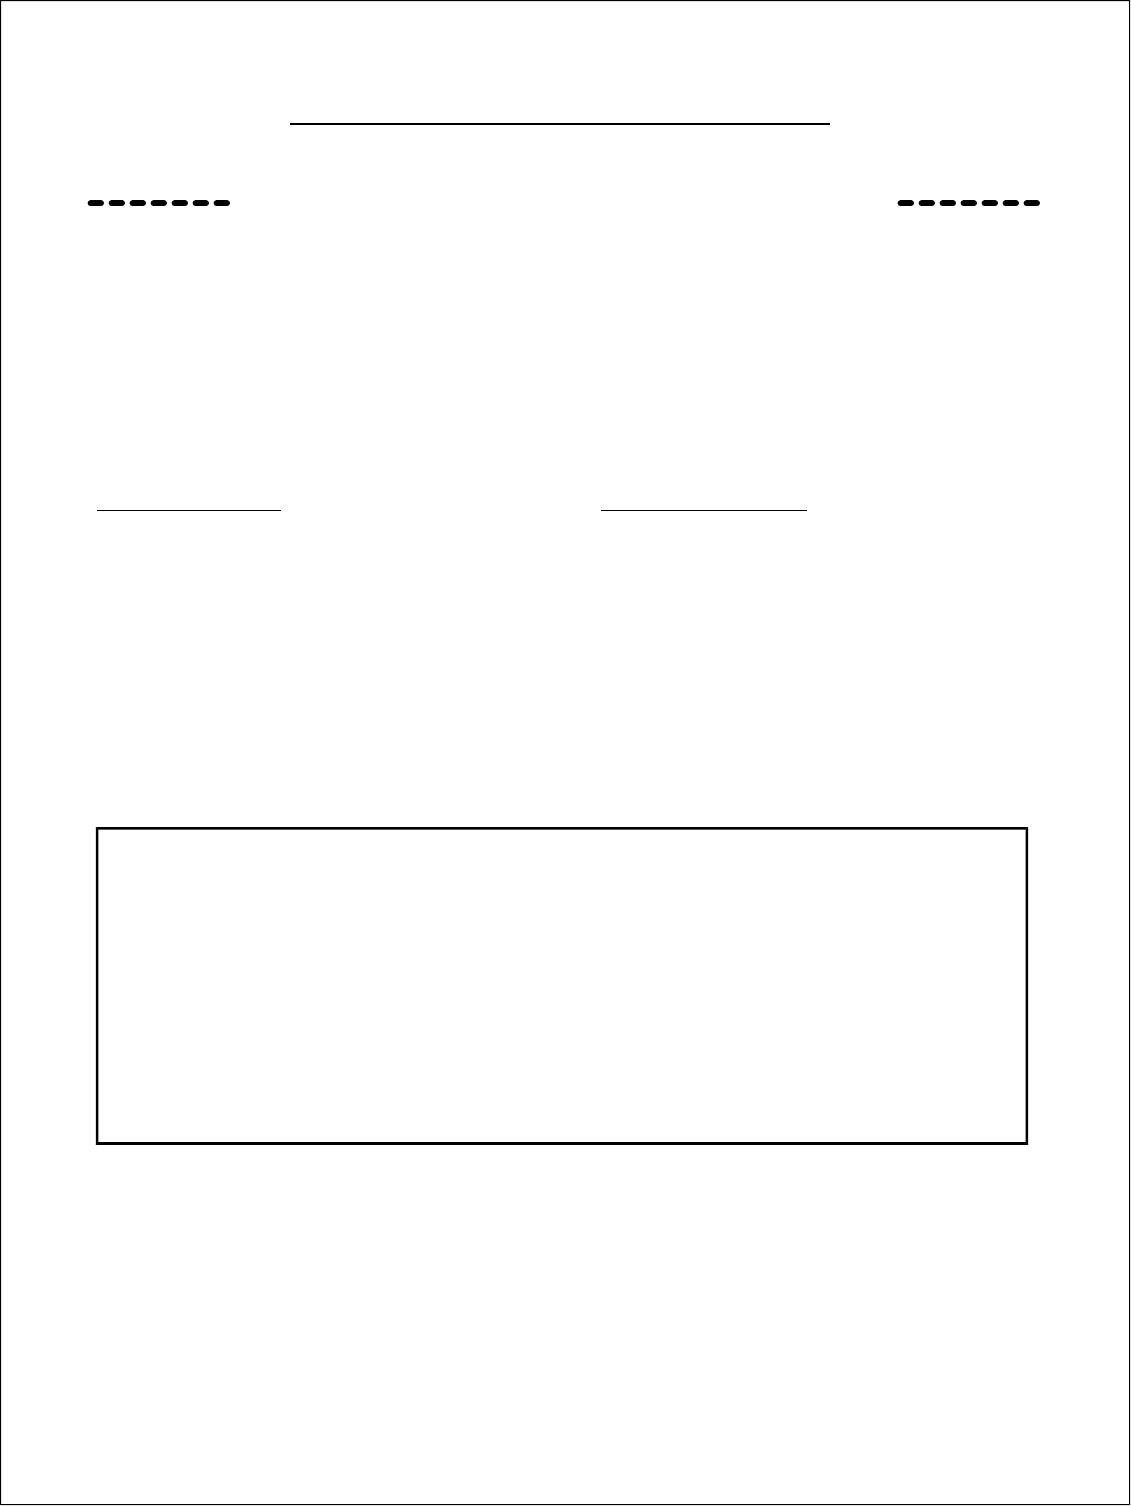 Confidential Fax Cover Sheet 3